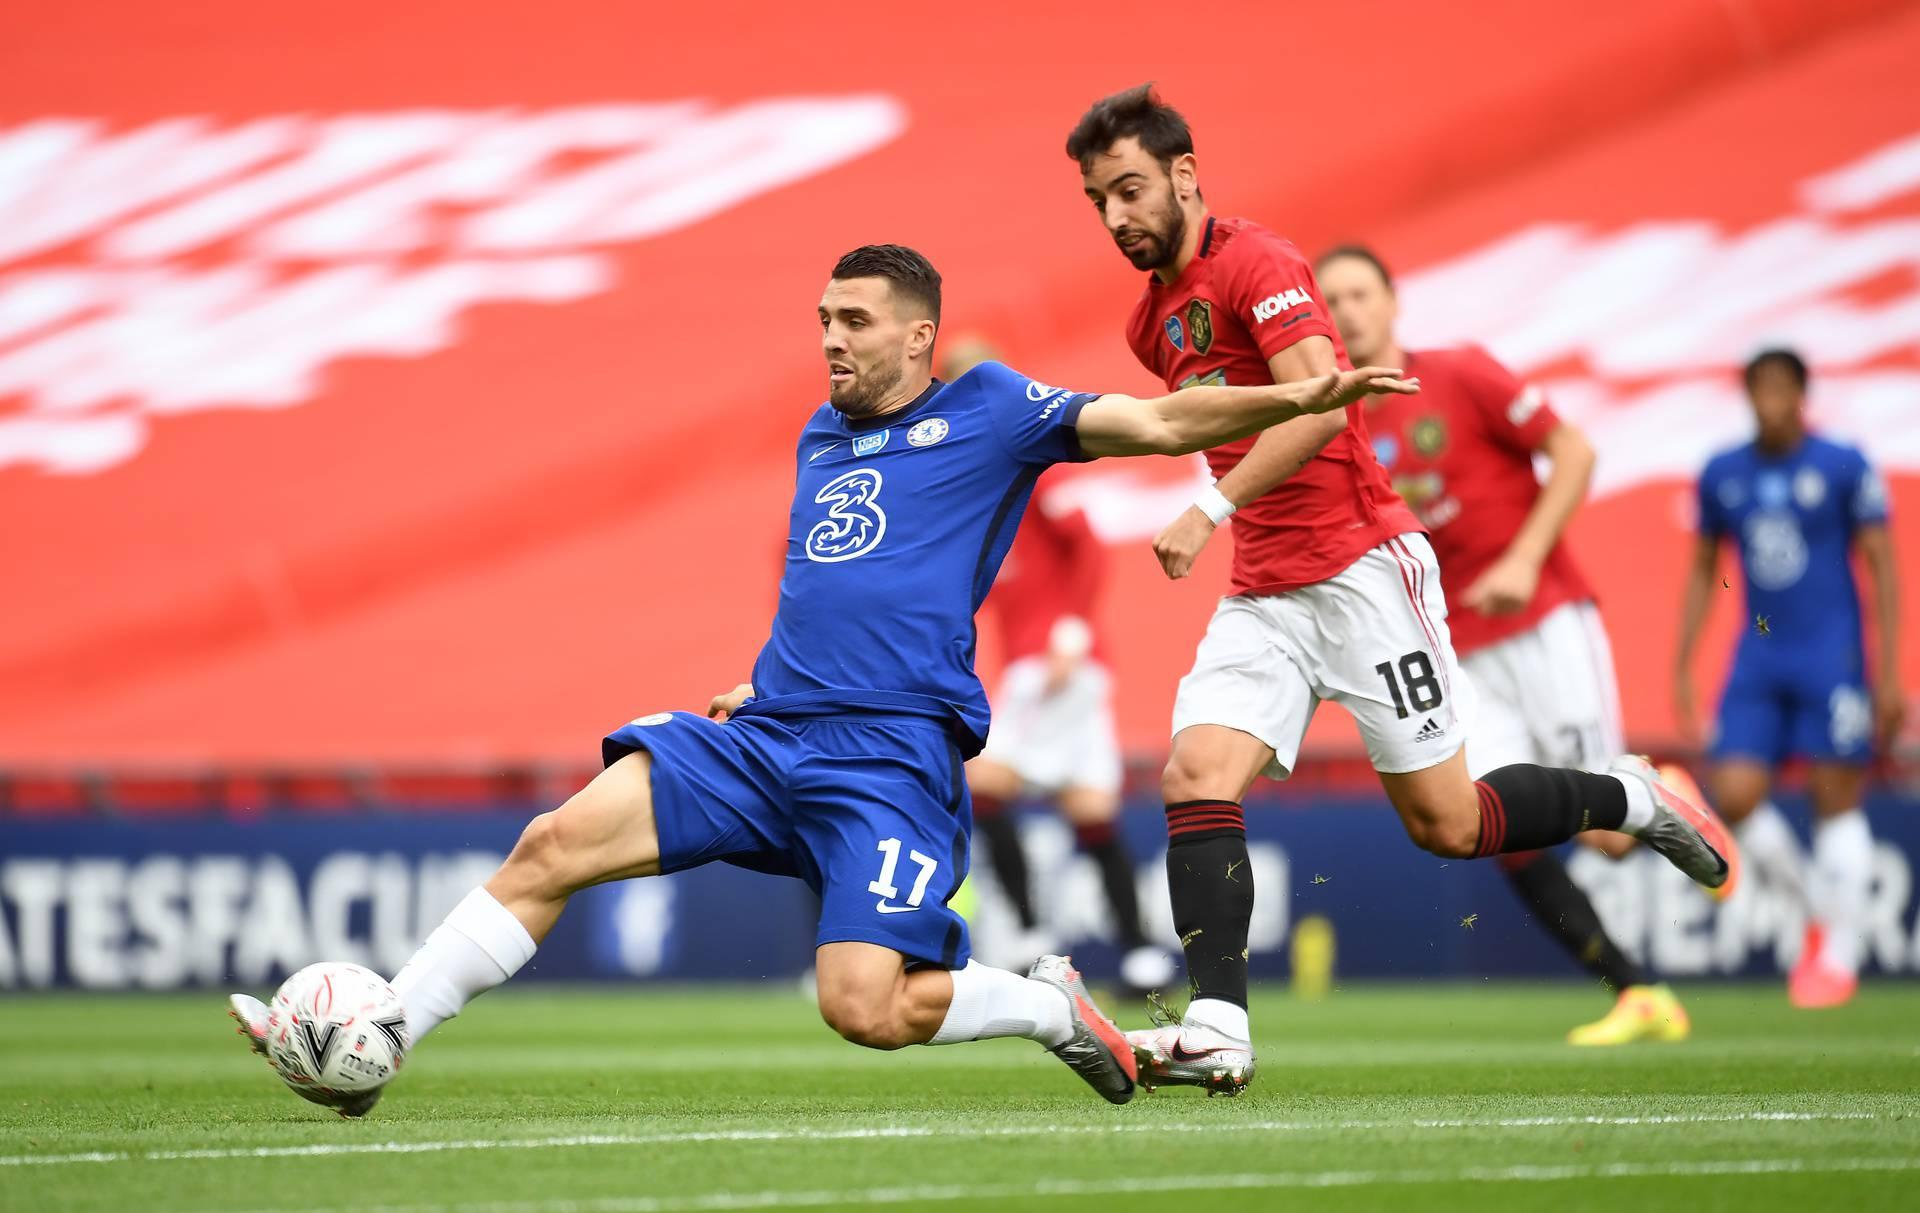 Manchester United v Chelsea - FA Cup - Semi Final - Wembley Stadium